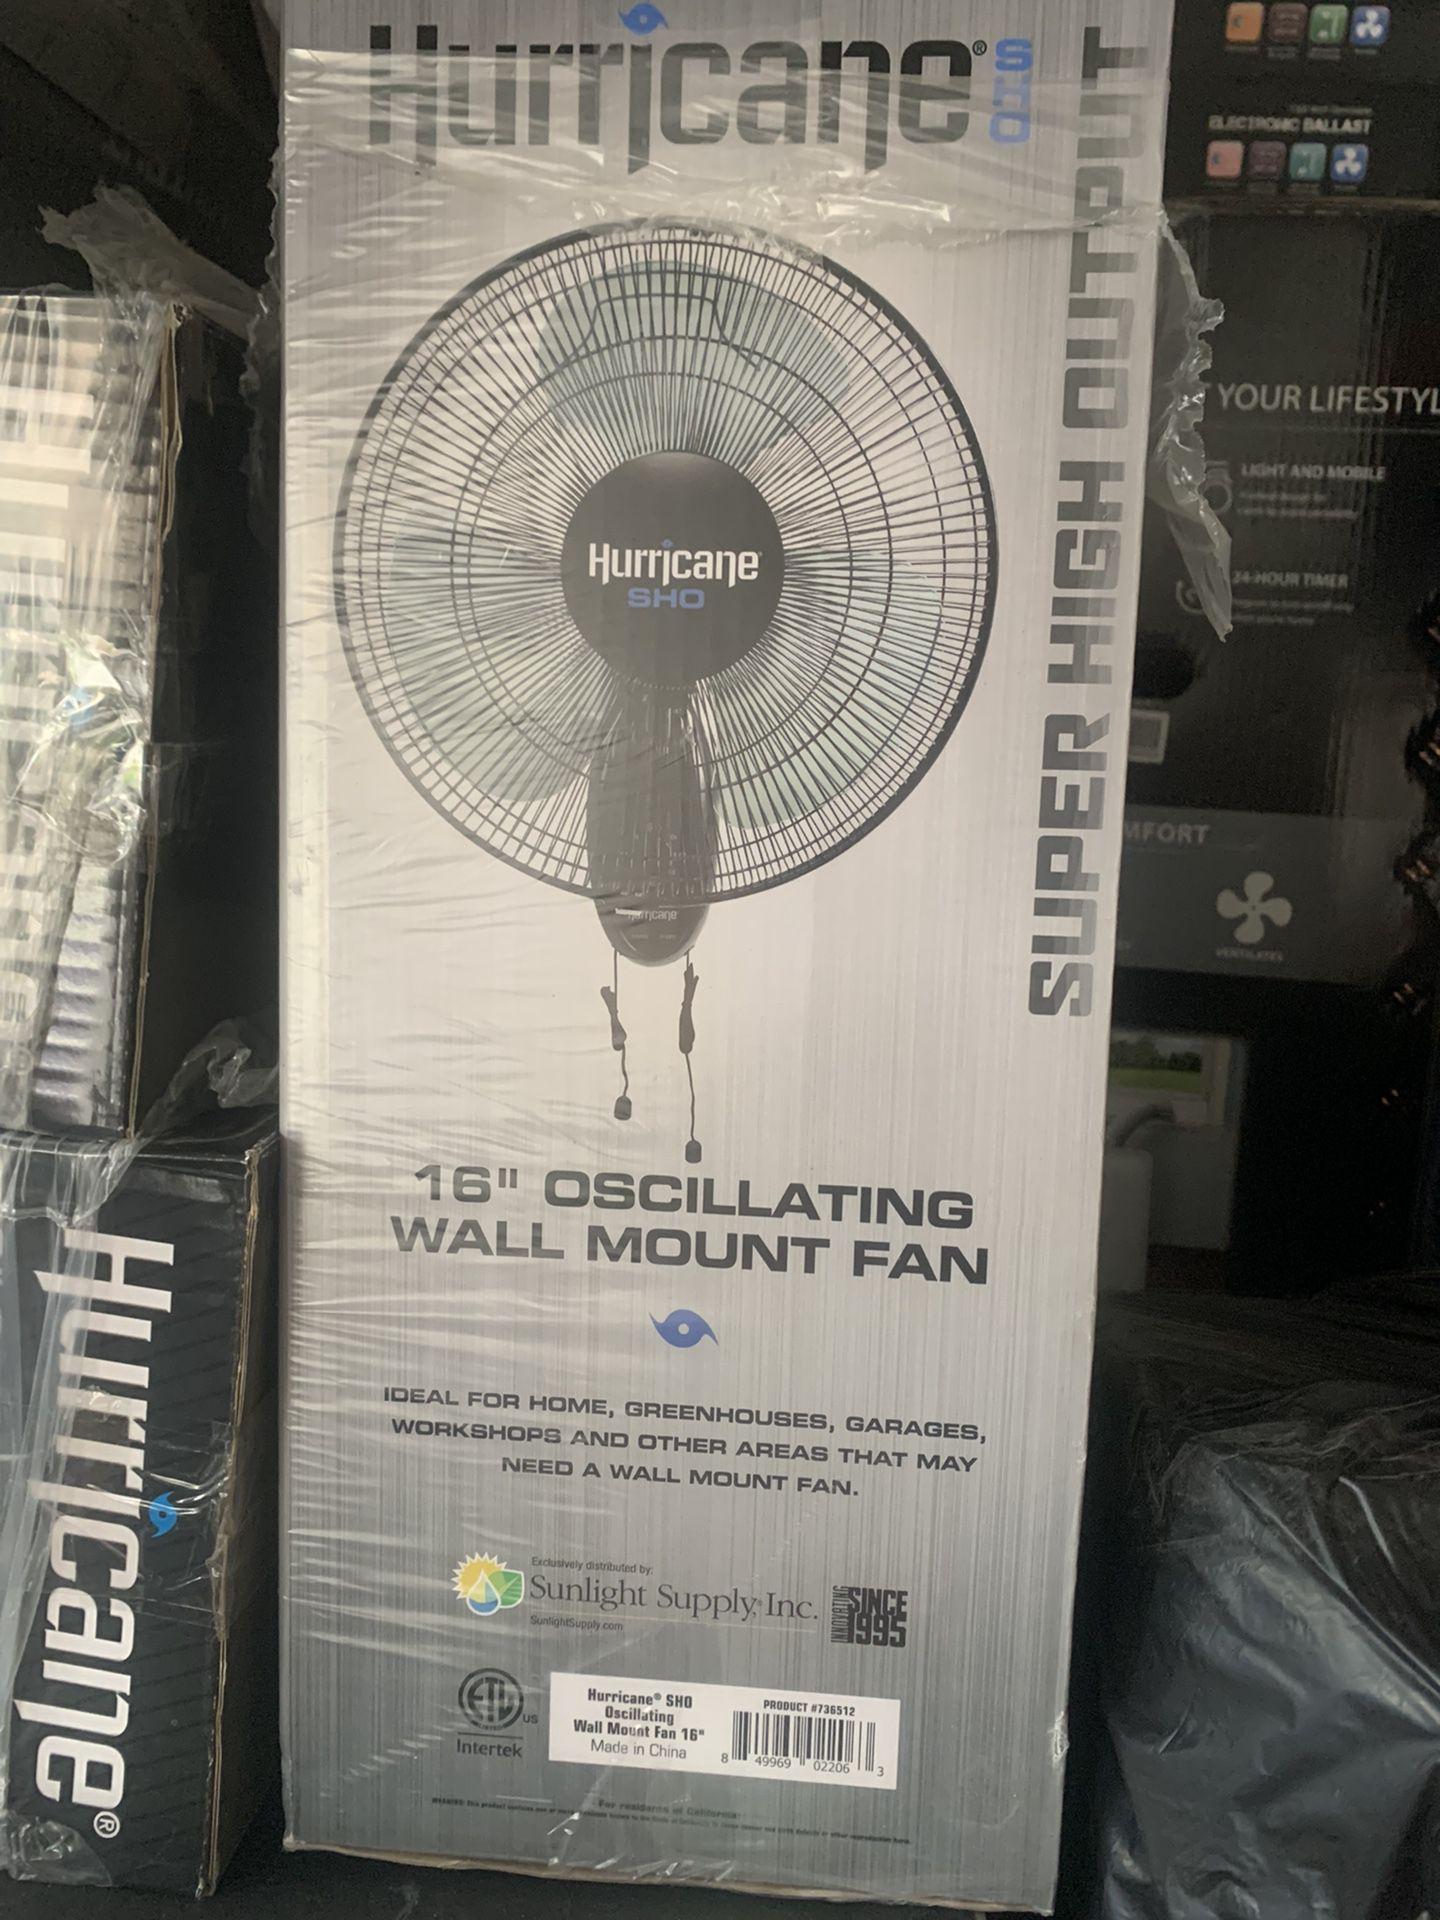 Hurricane Oscillating Wall Mount Fan